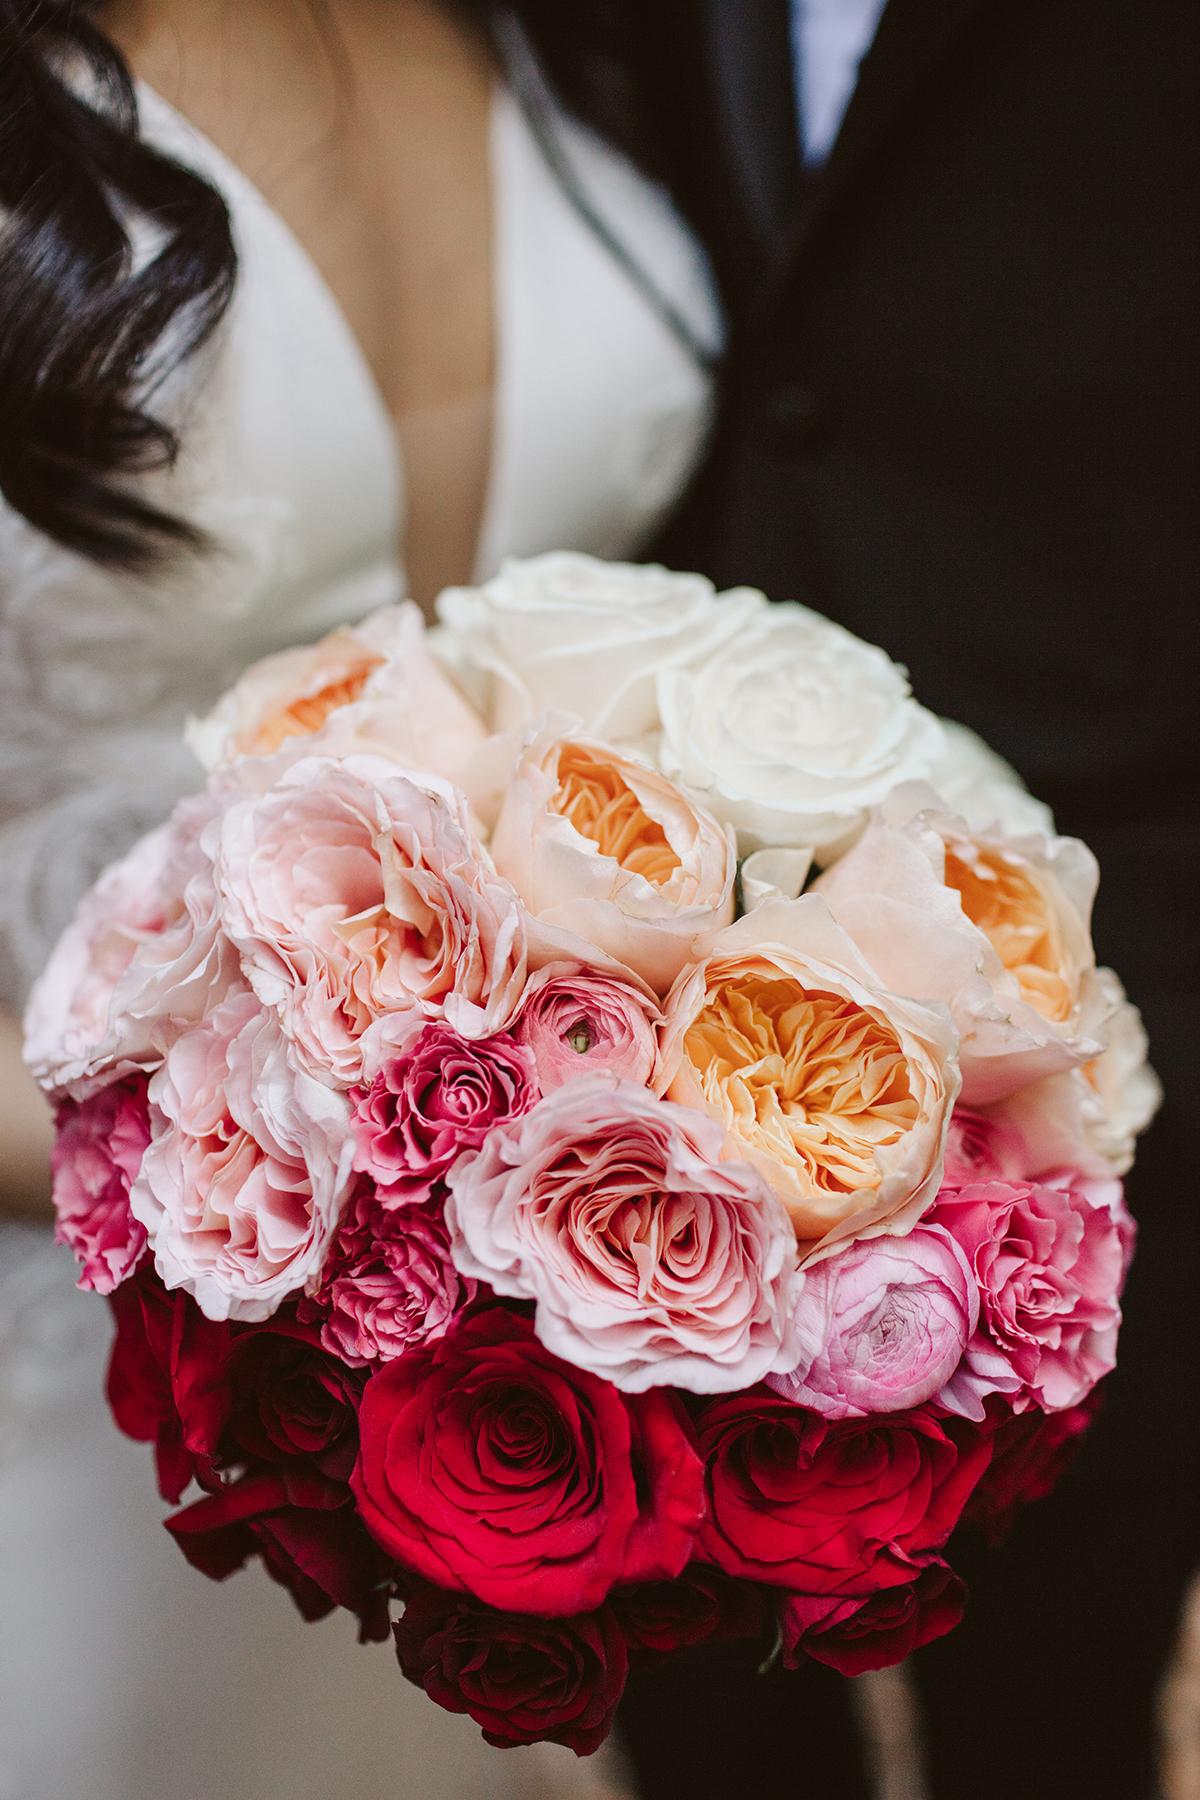 How I Designed My Bridal Bouquet (Designing Wedding Flowers: Part1/3)